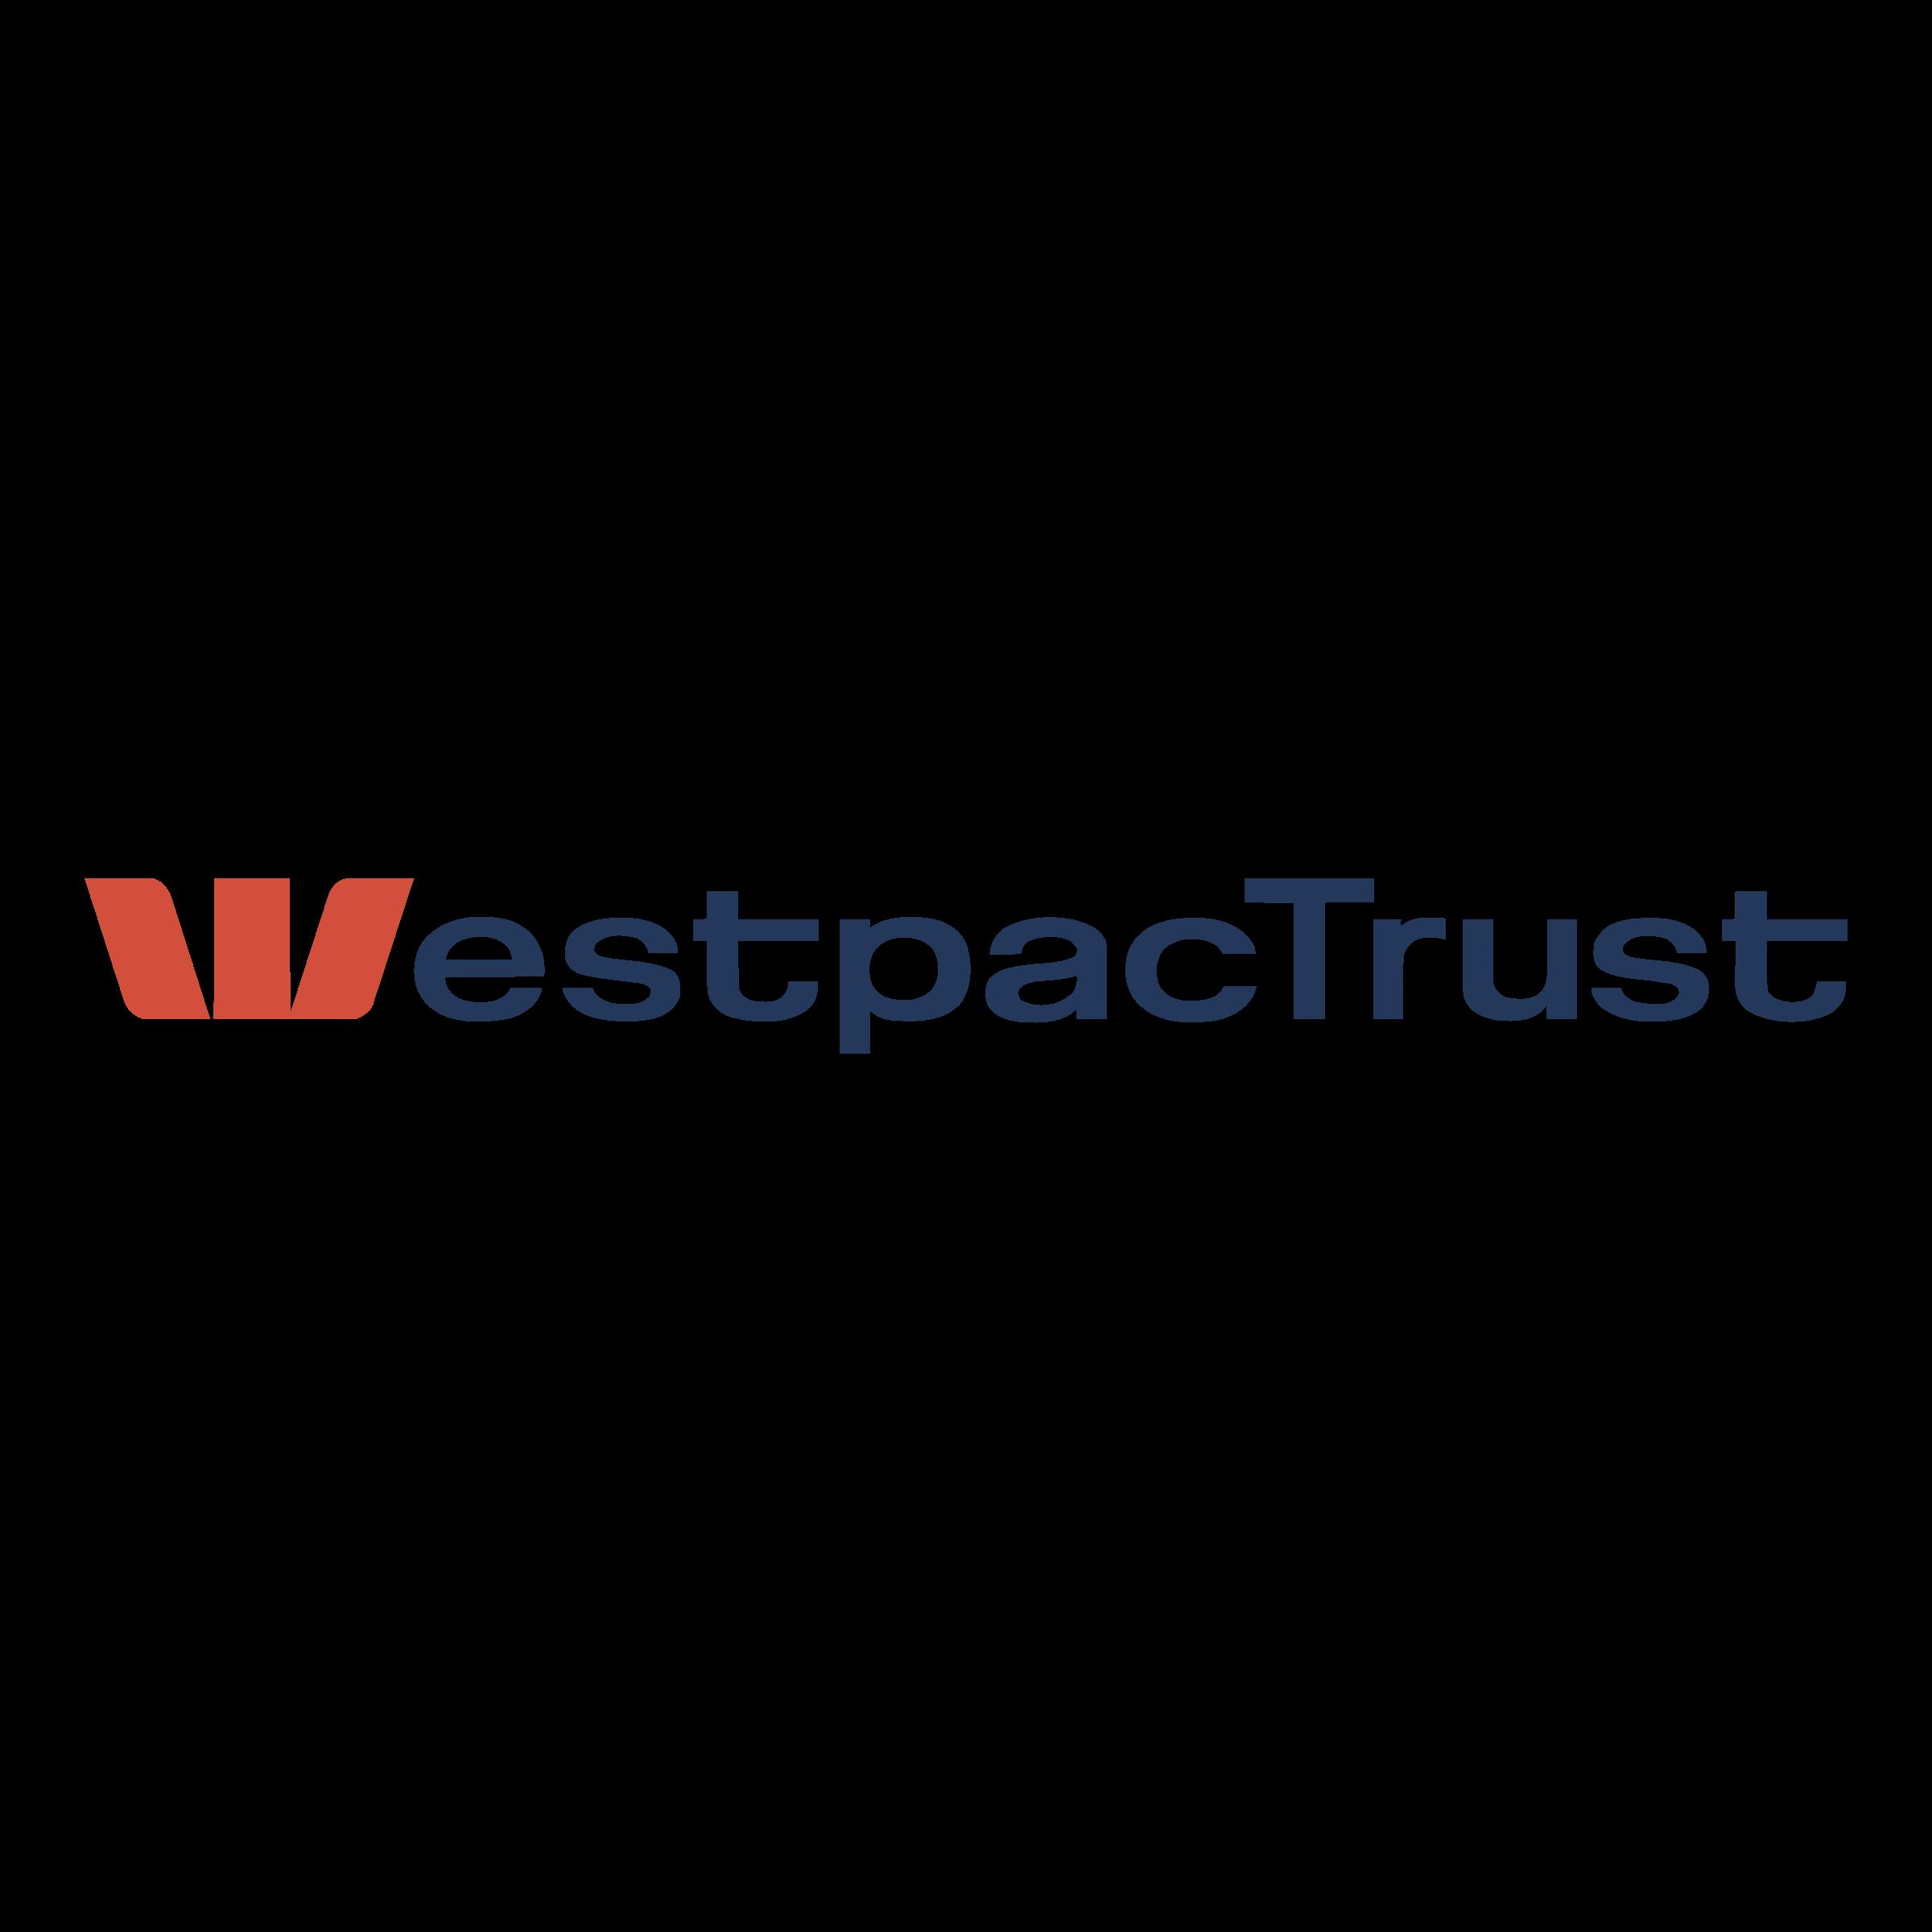 Westpac Trust Logo PNG Transparent & SVG Vector.